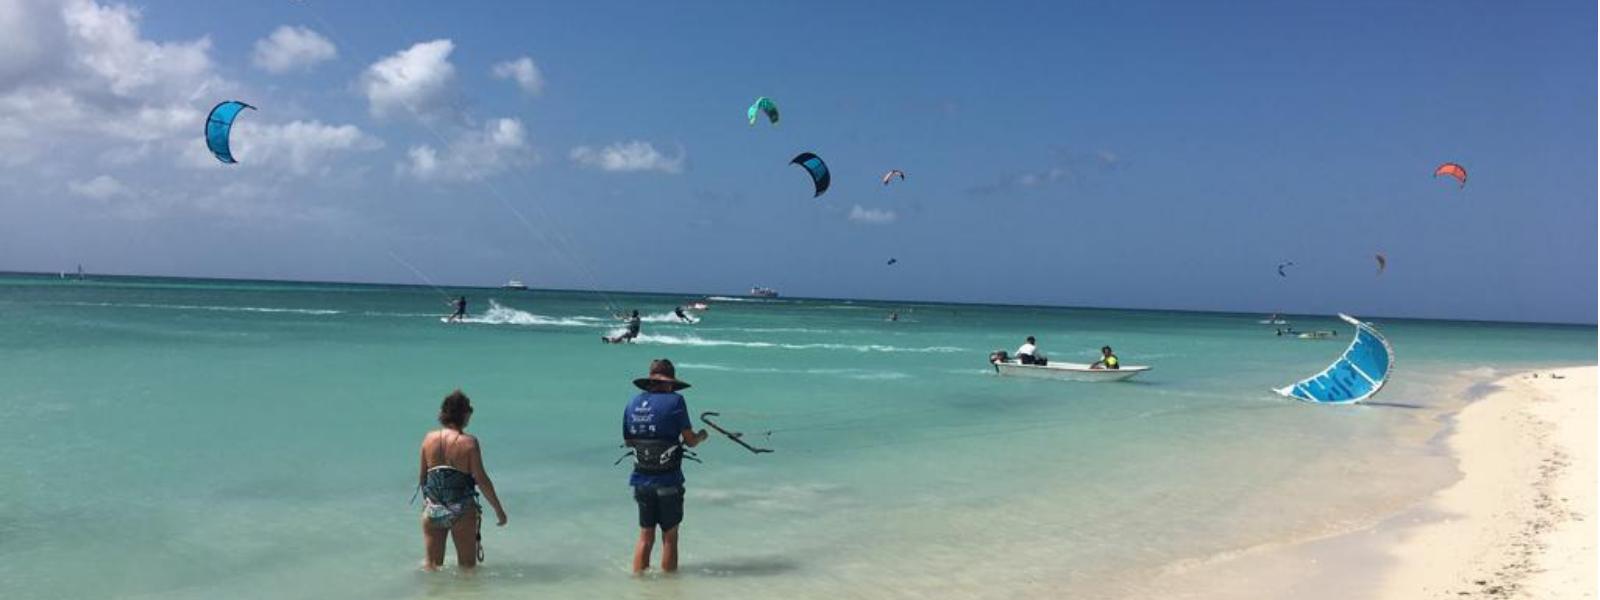 Kitesurf-les op Aruba zeker doen!